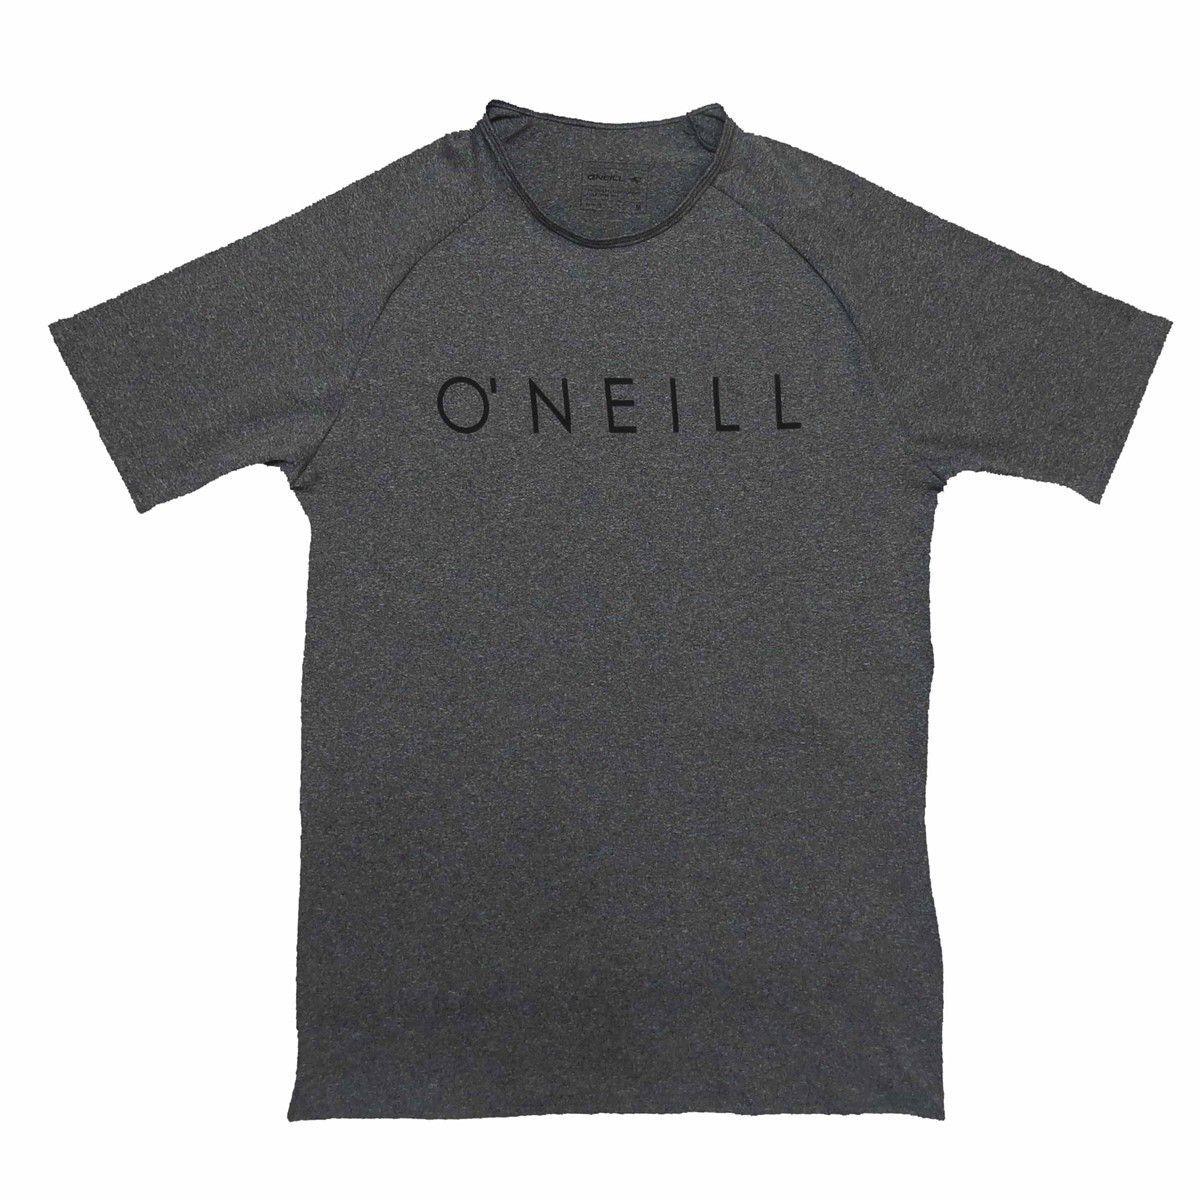 Camiseta O'neill Raglan Hibrida Gray